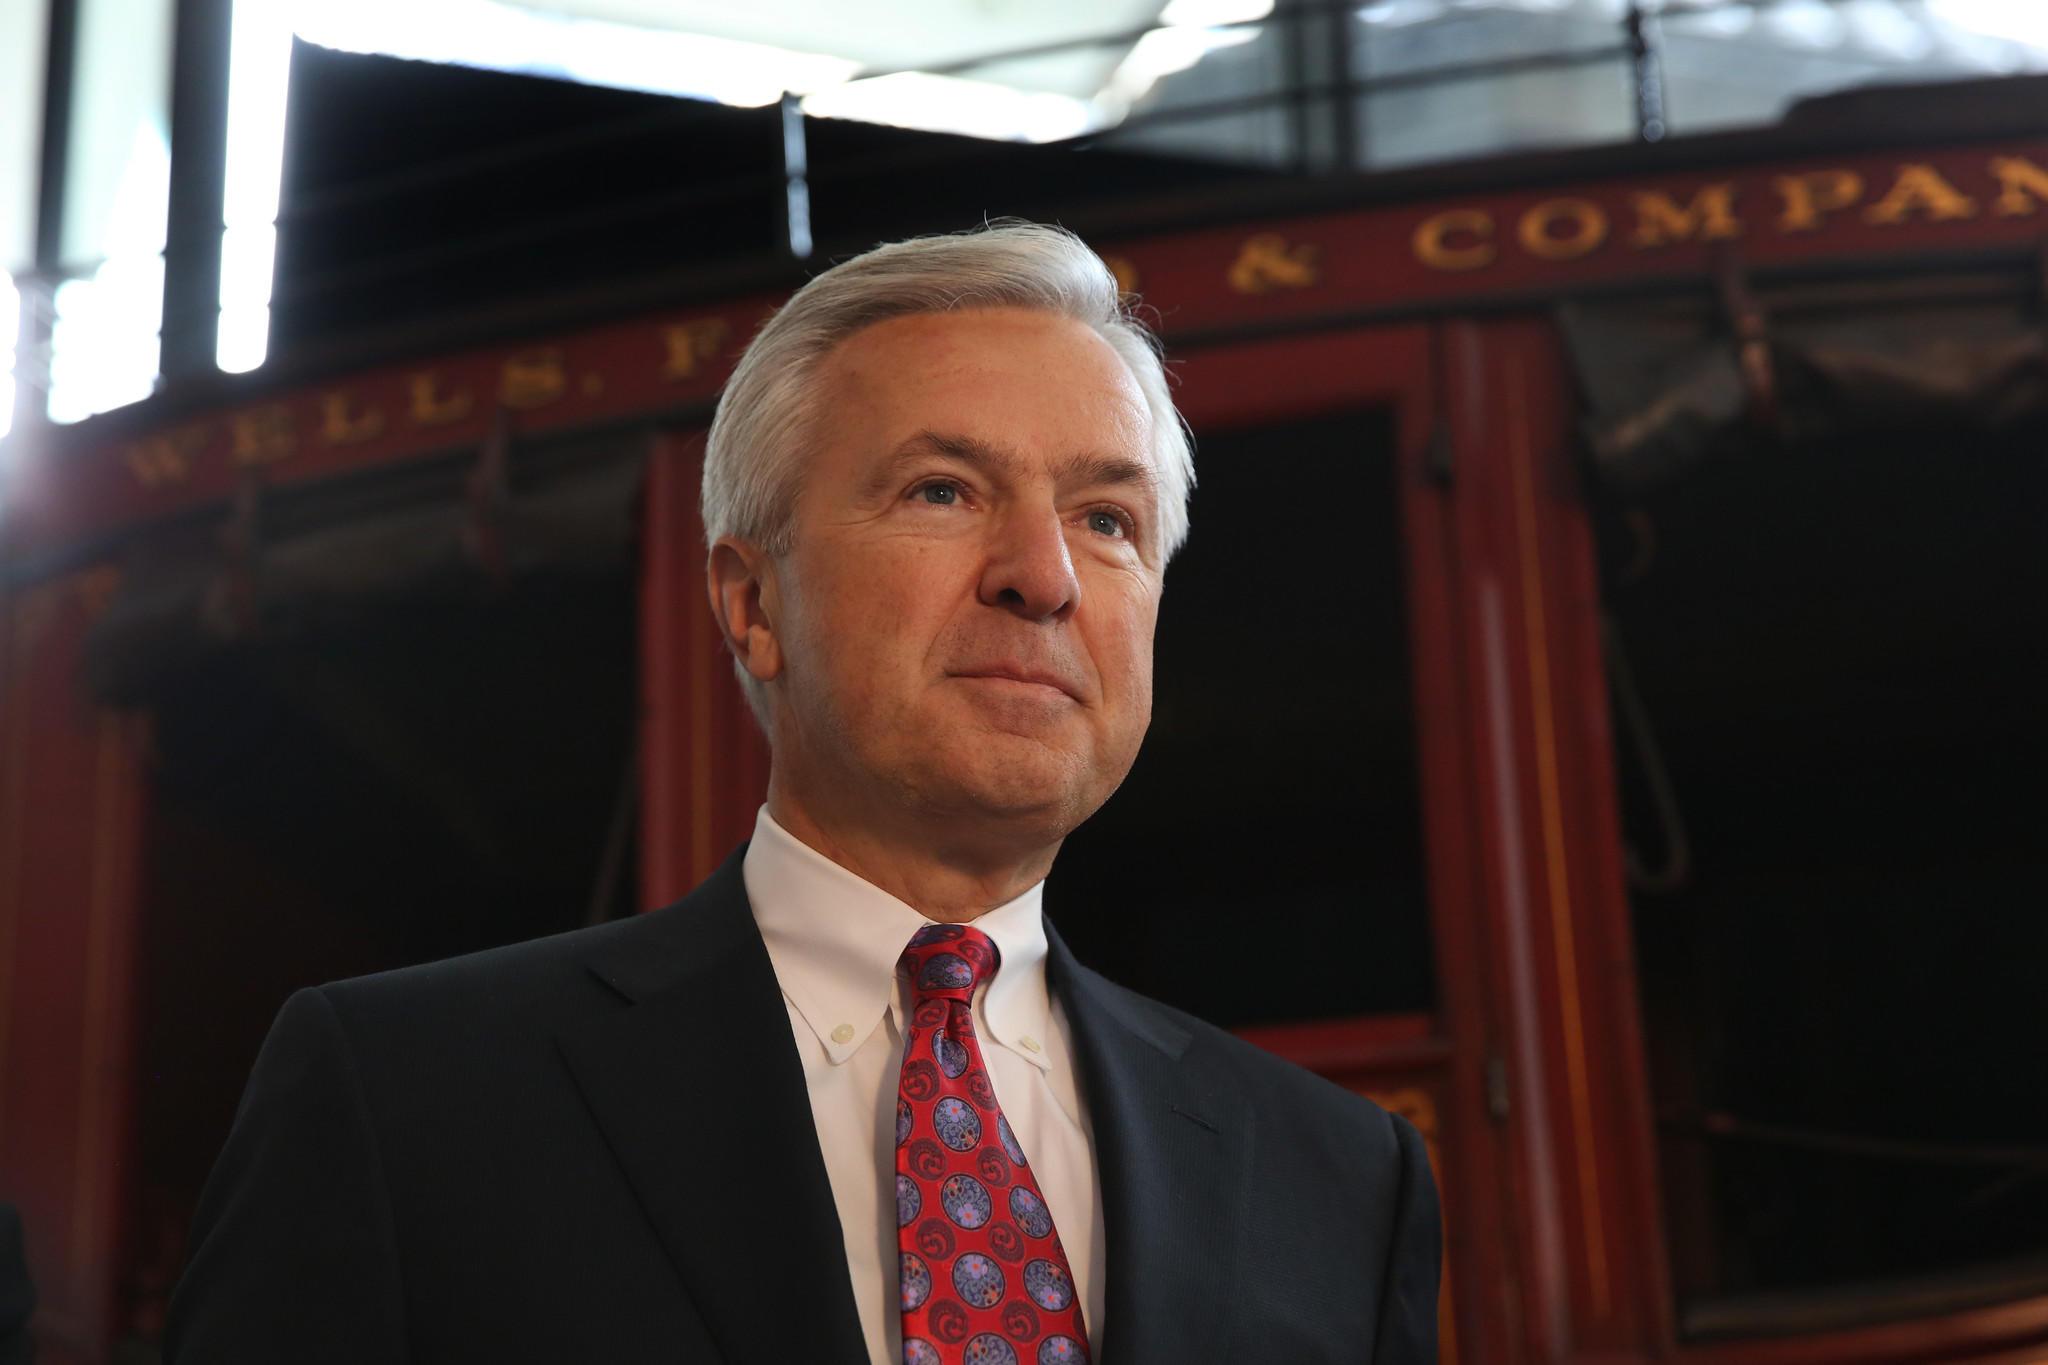 Wells Fargo CEO John Stumpf.